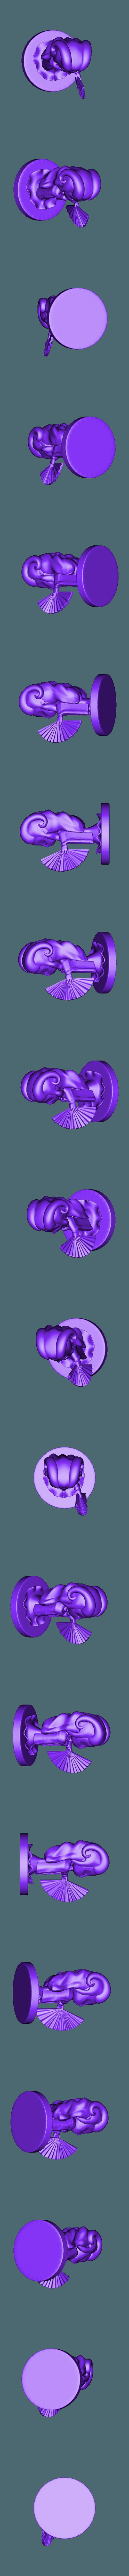 Demon_Warlock_Fehria.stl Download free STL file Demon Warlock Fehria • 3D printing object, HyperMiniatures